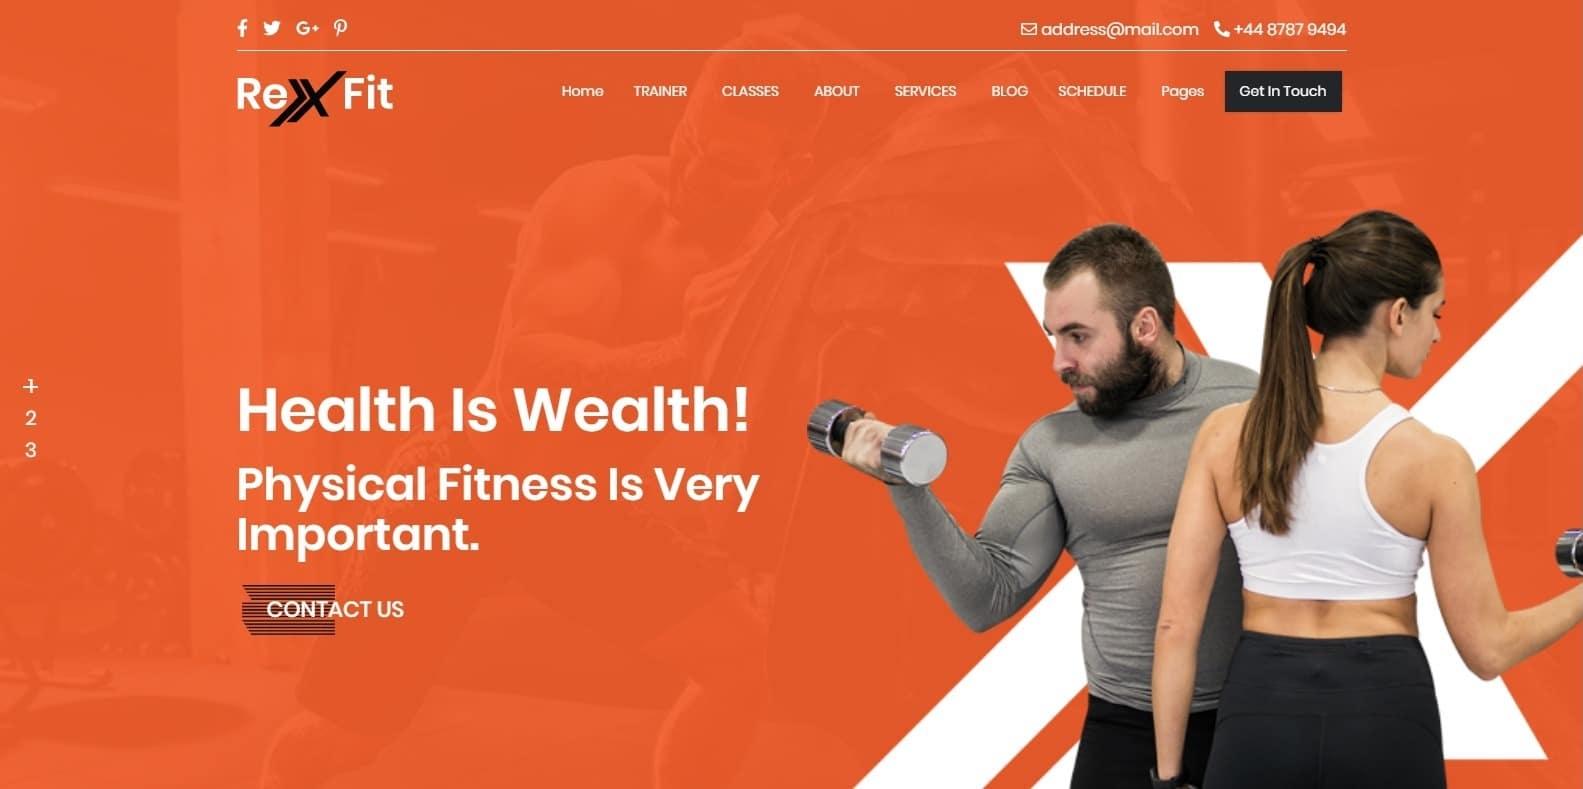 rexfit-gym-website-template